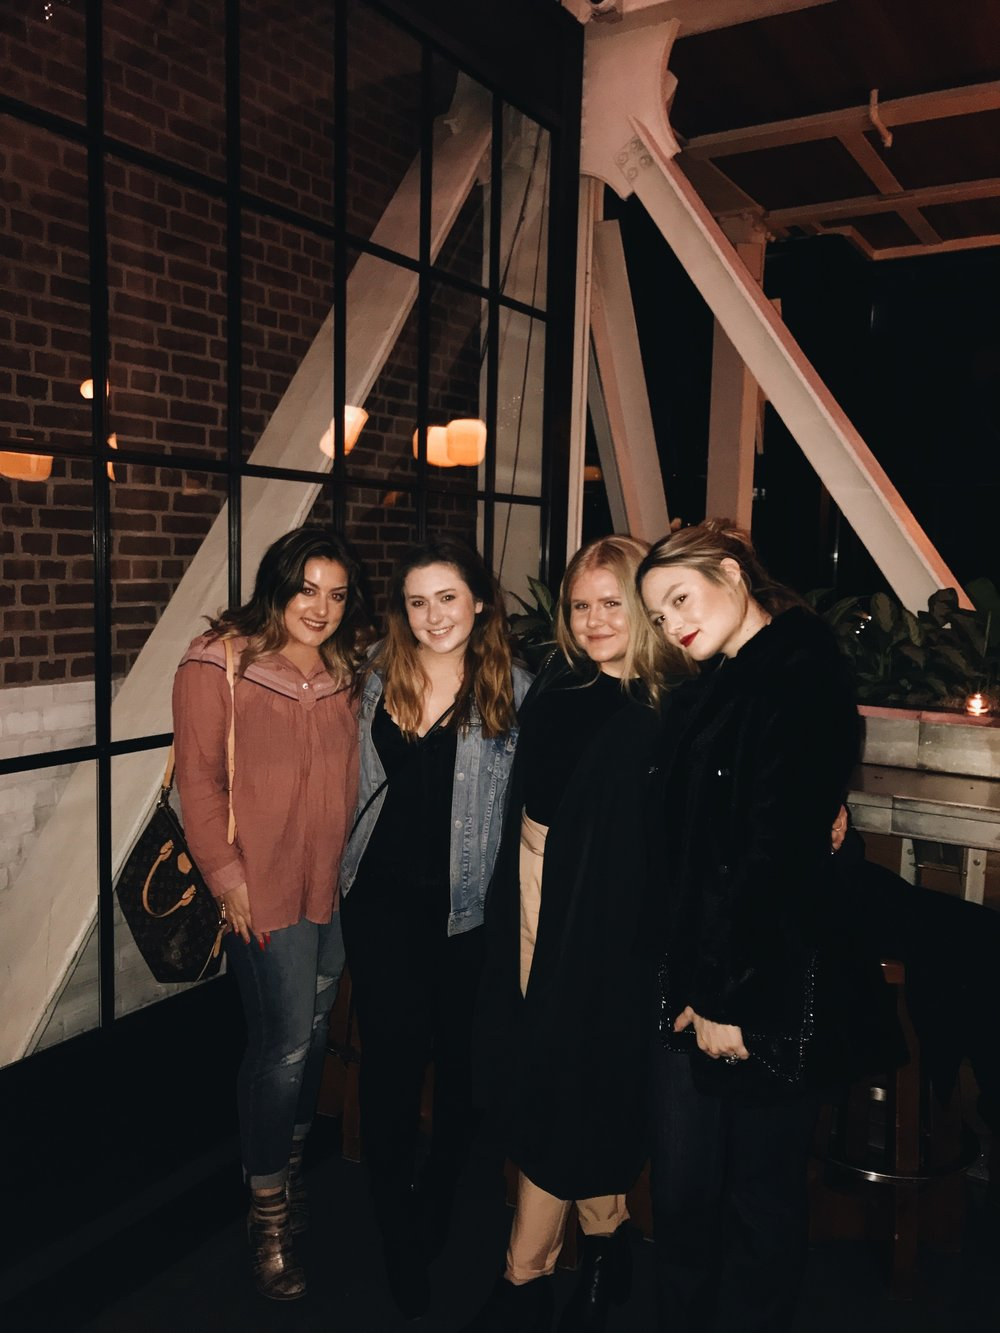 Carly, Haley, me, and Eleni